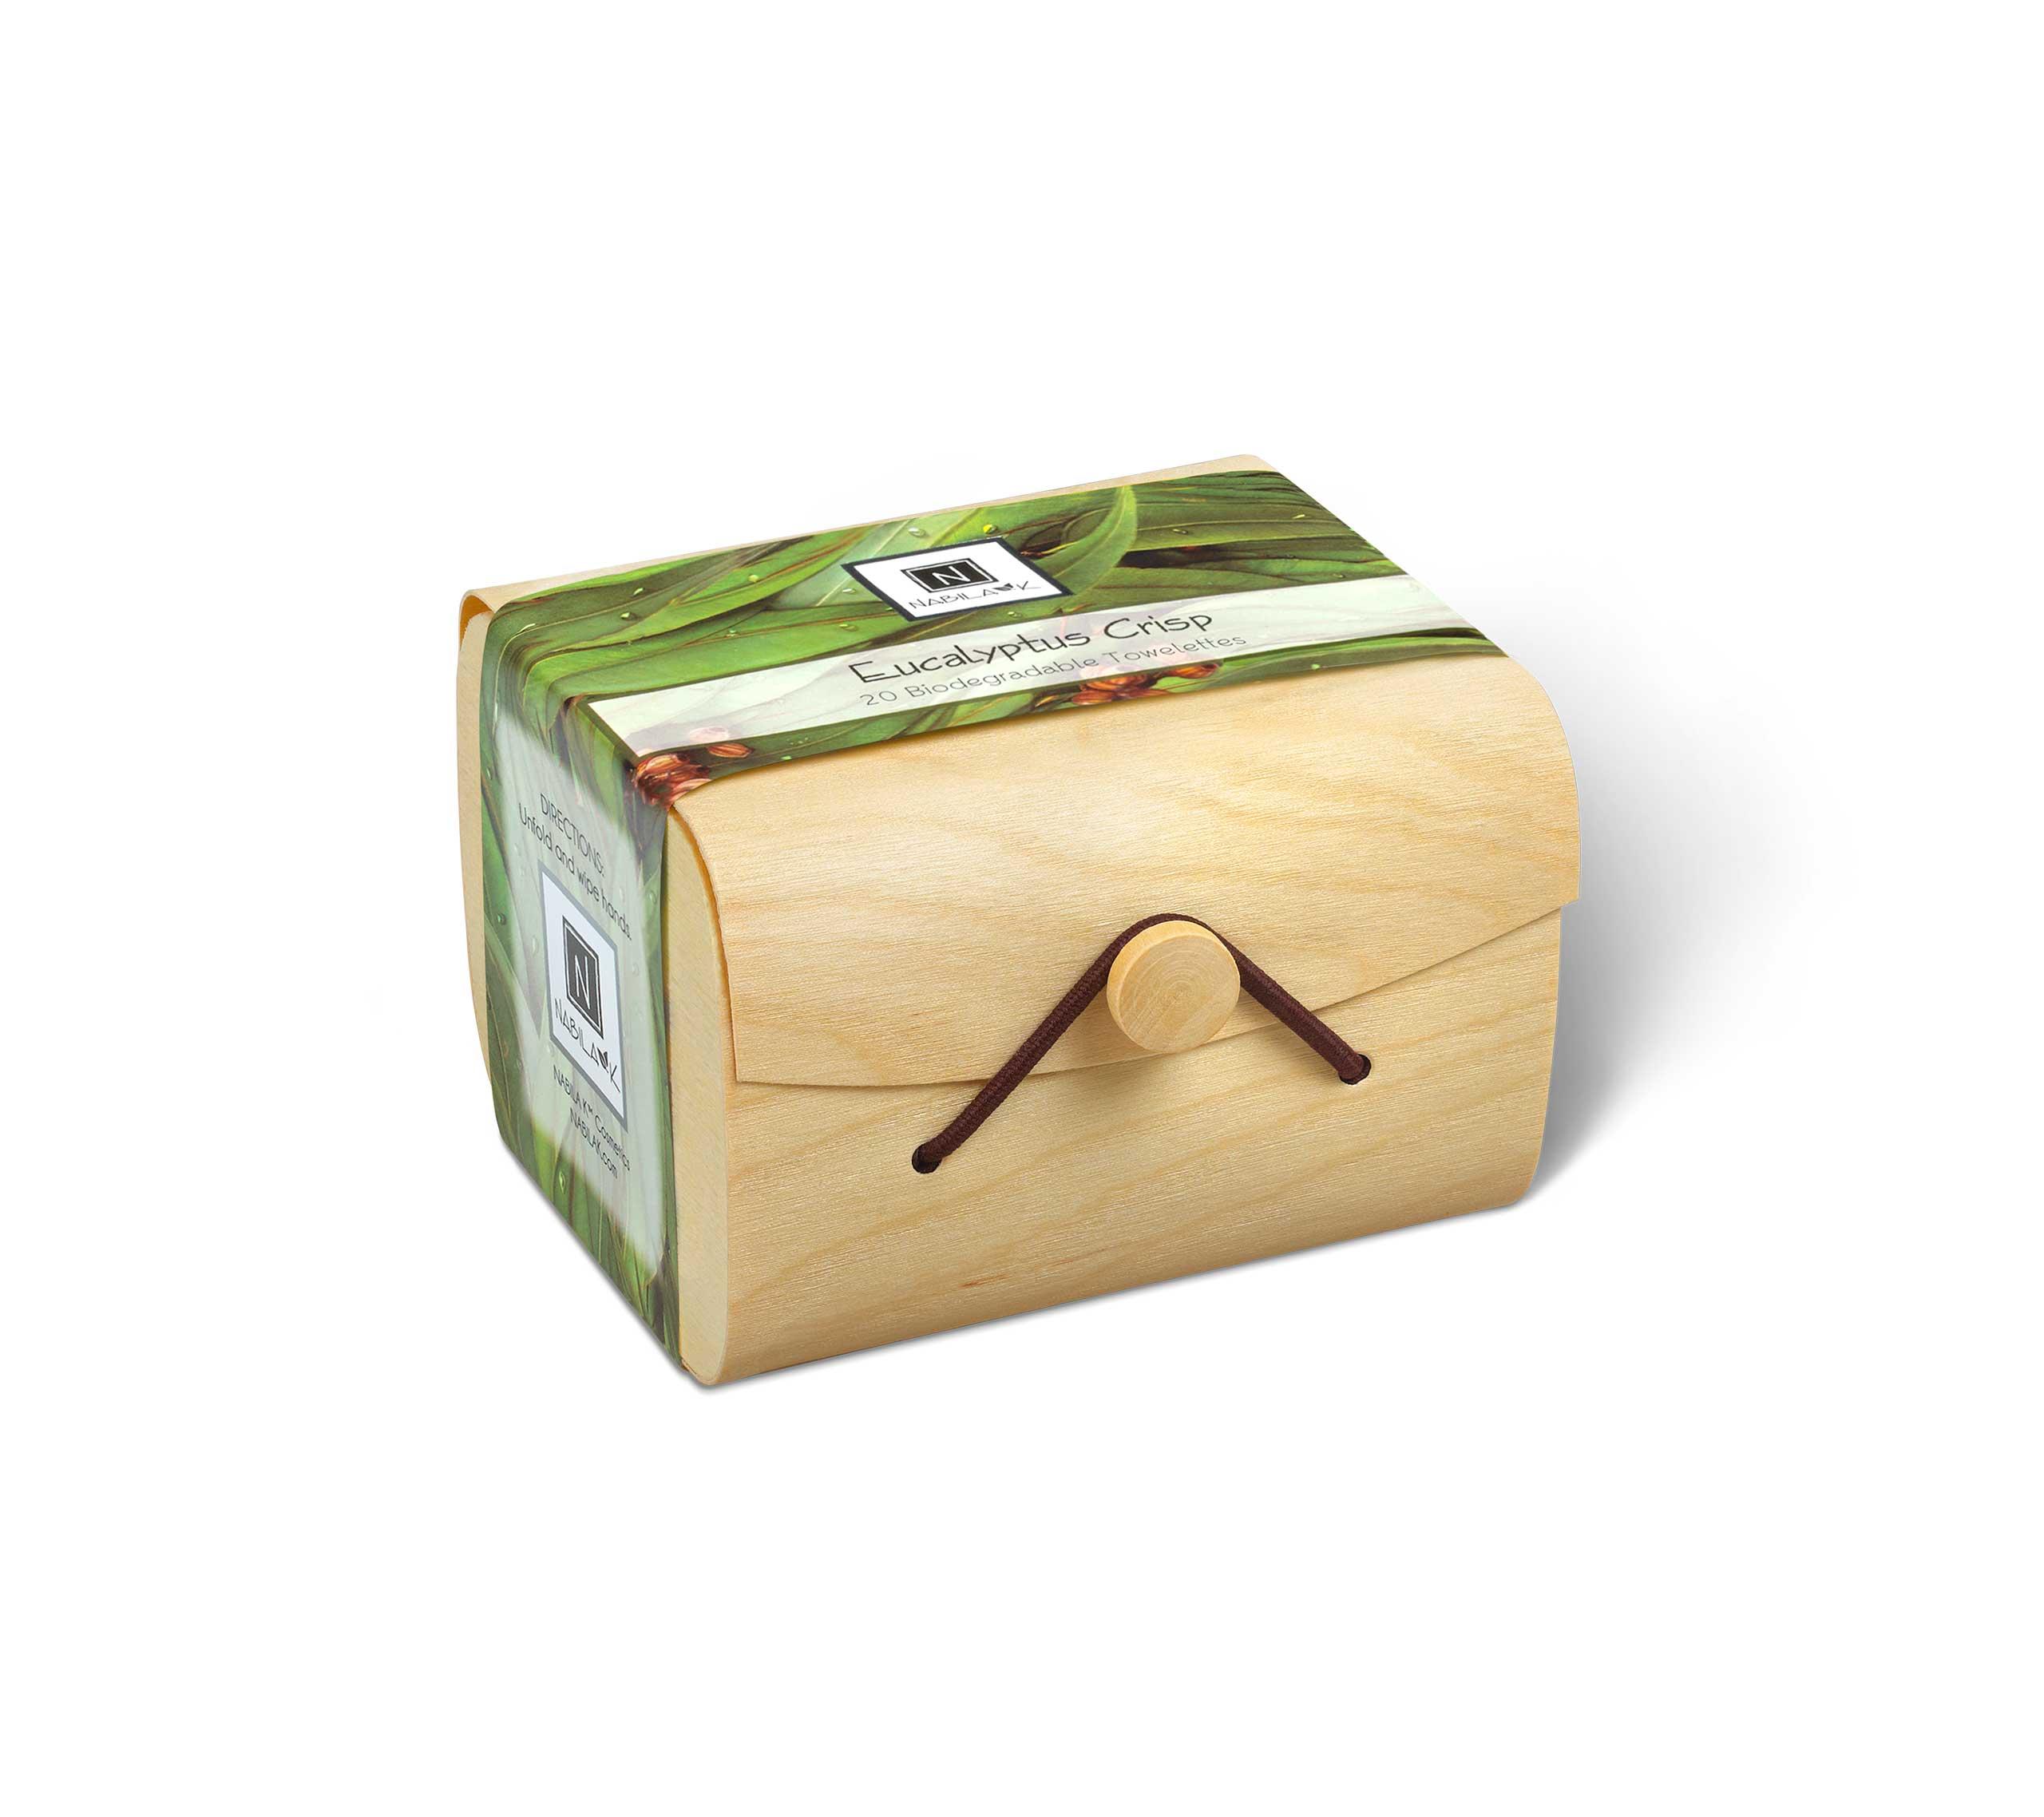 1 wooden box of Nabila K's Eucalyptus Crisp Biodegradable Towelettes